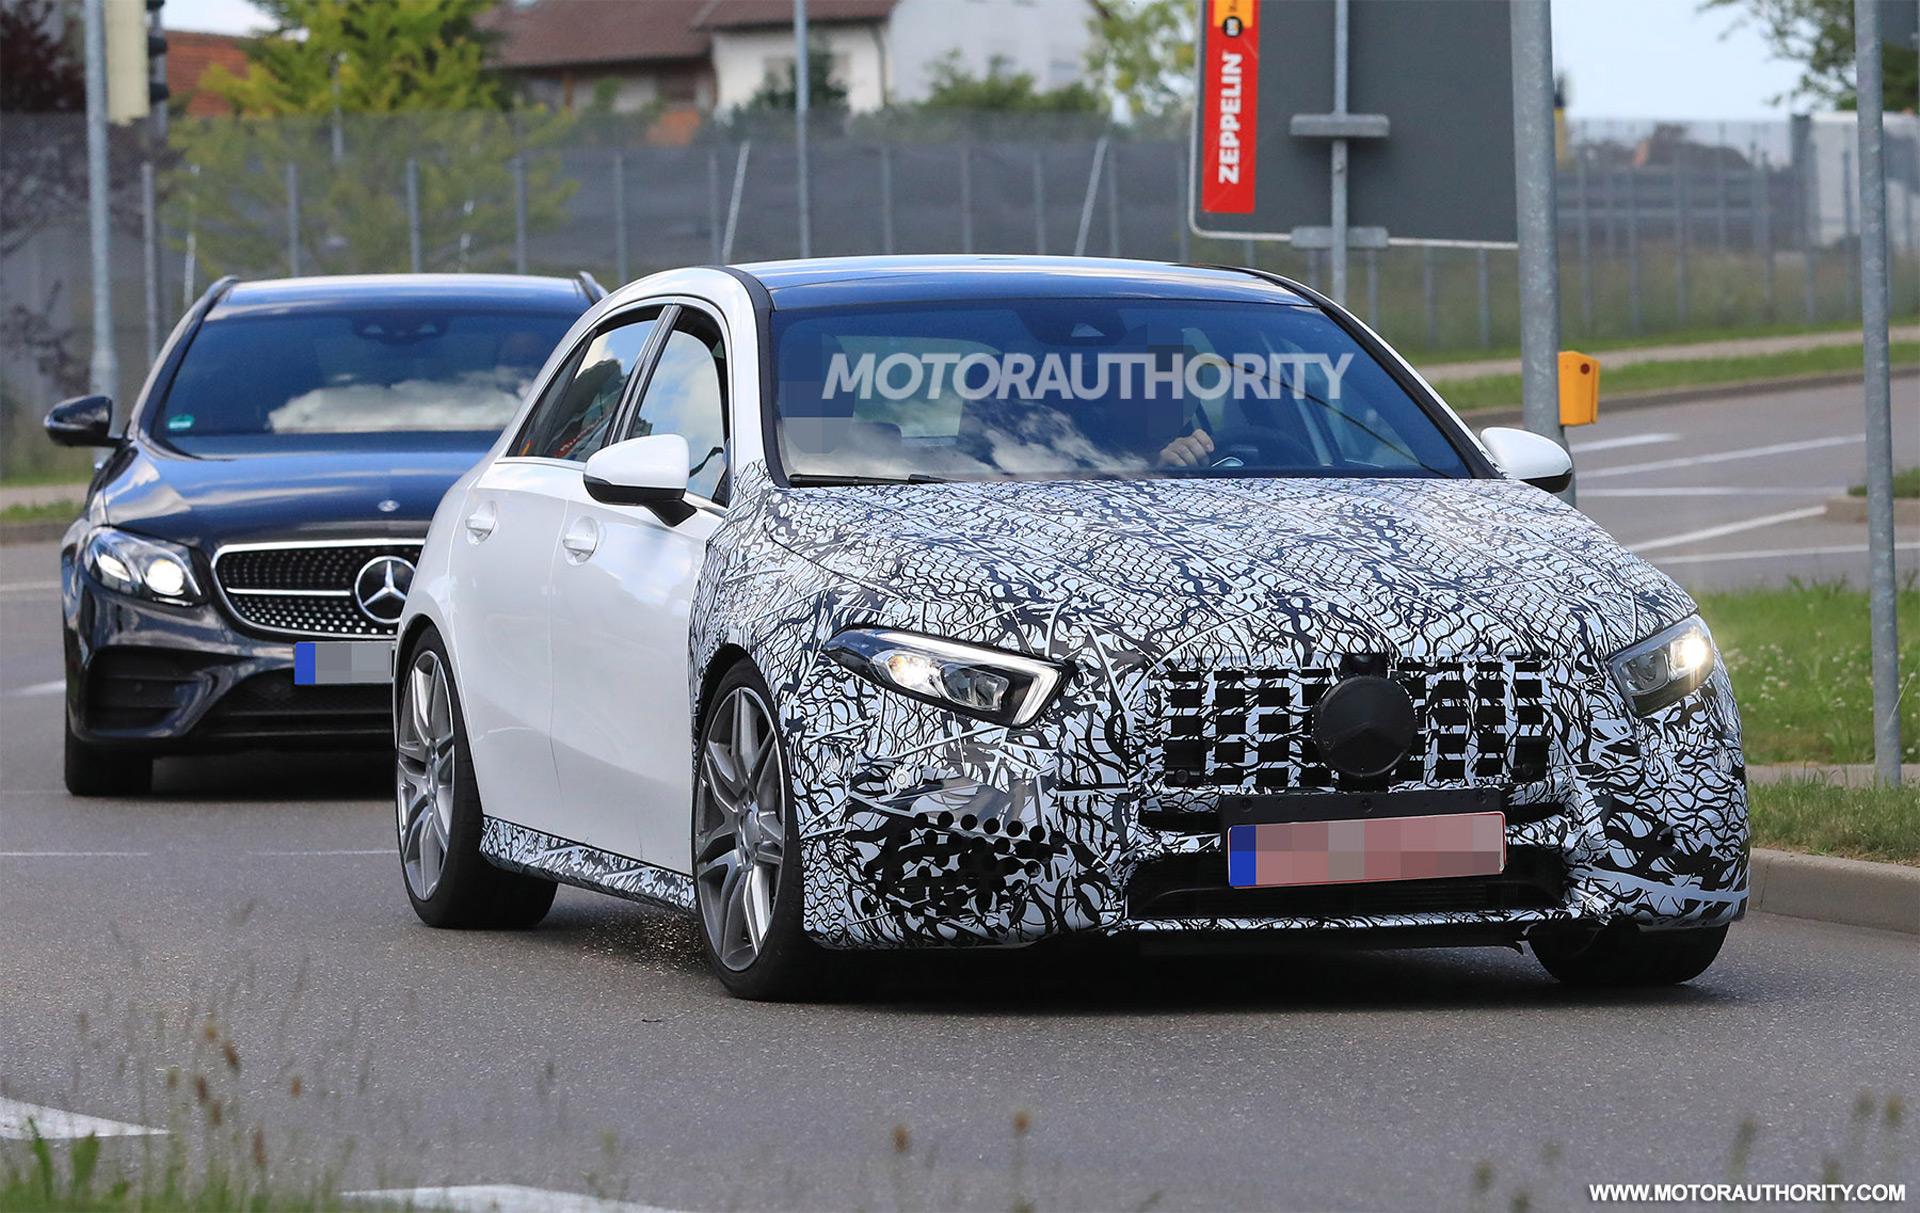 2020 Mercedes Amg A45 Hatchback Spy Shots And Video